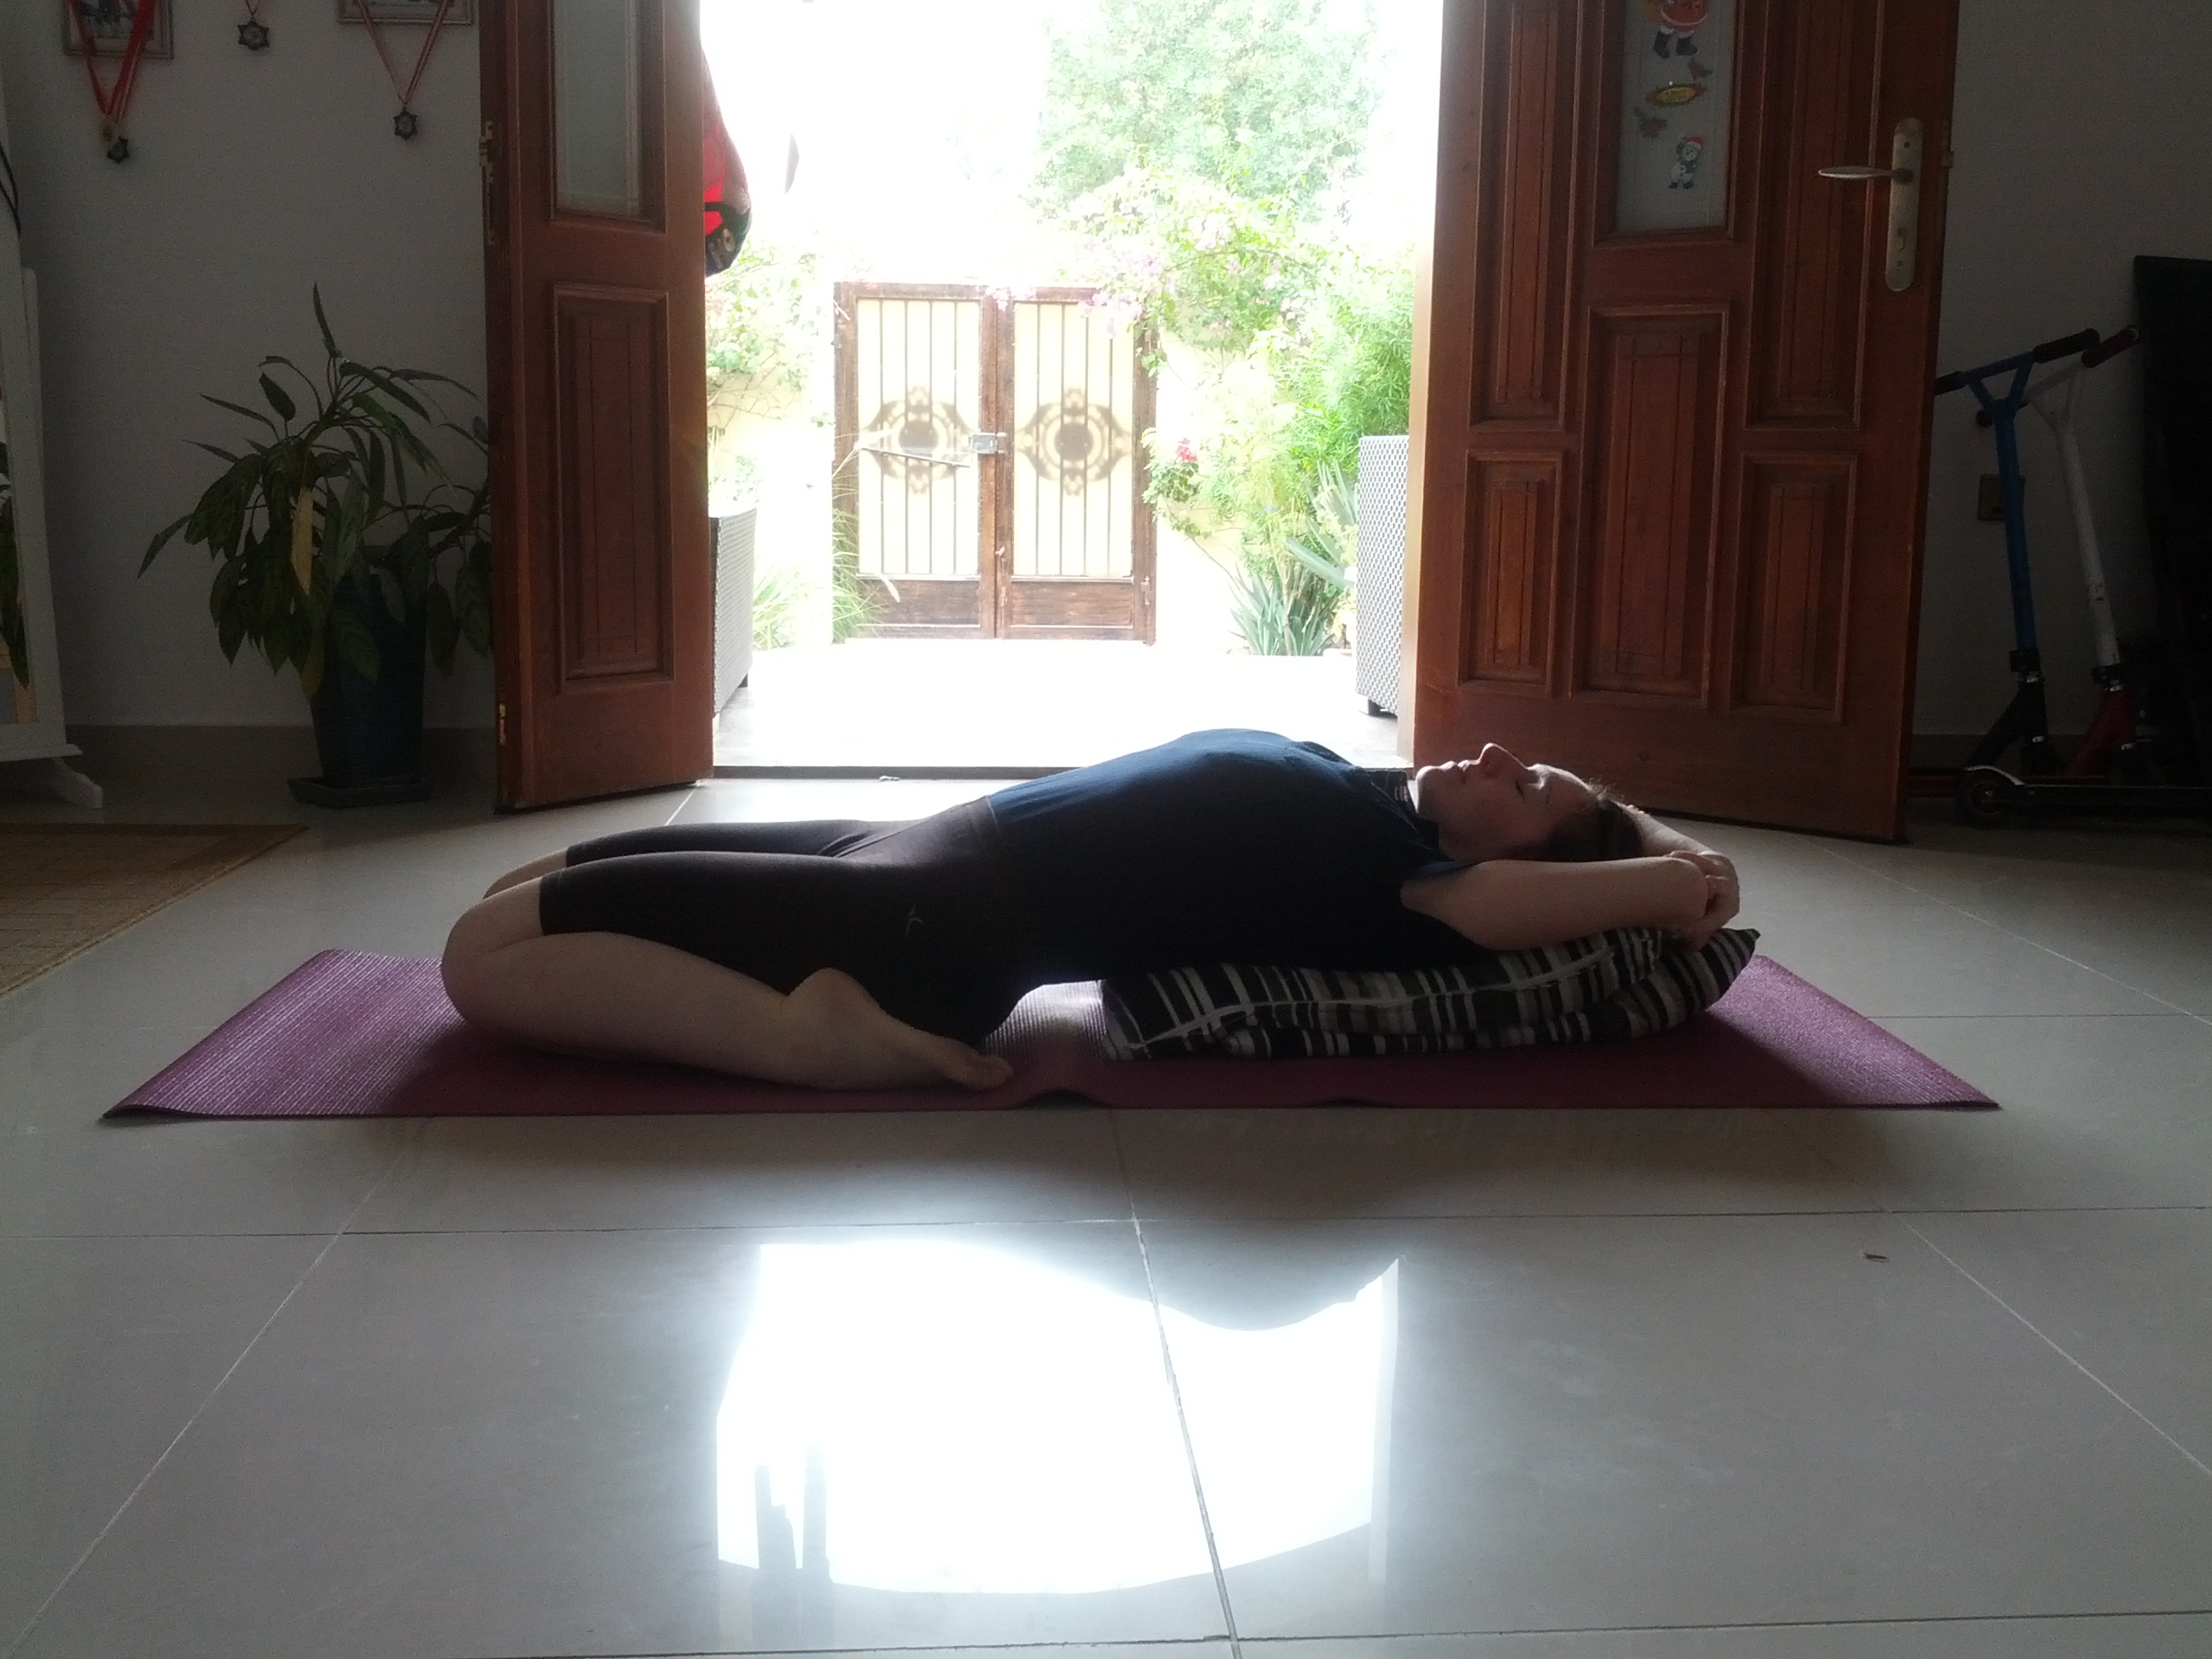 Supta Virasana - the reclining hero pose